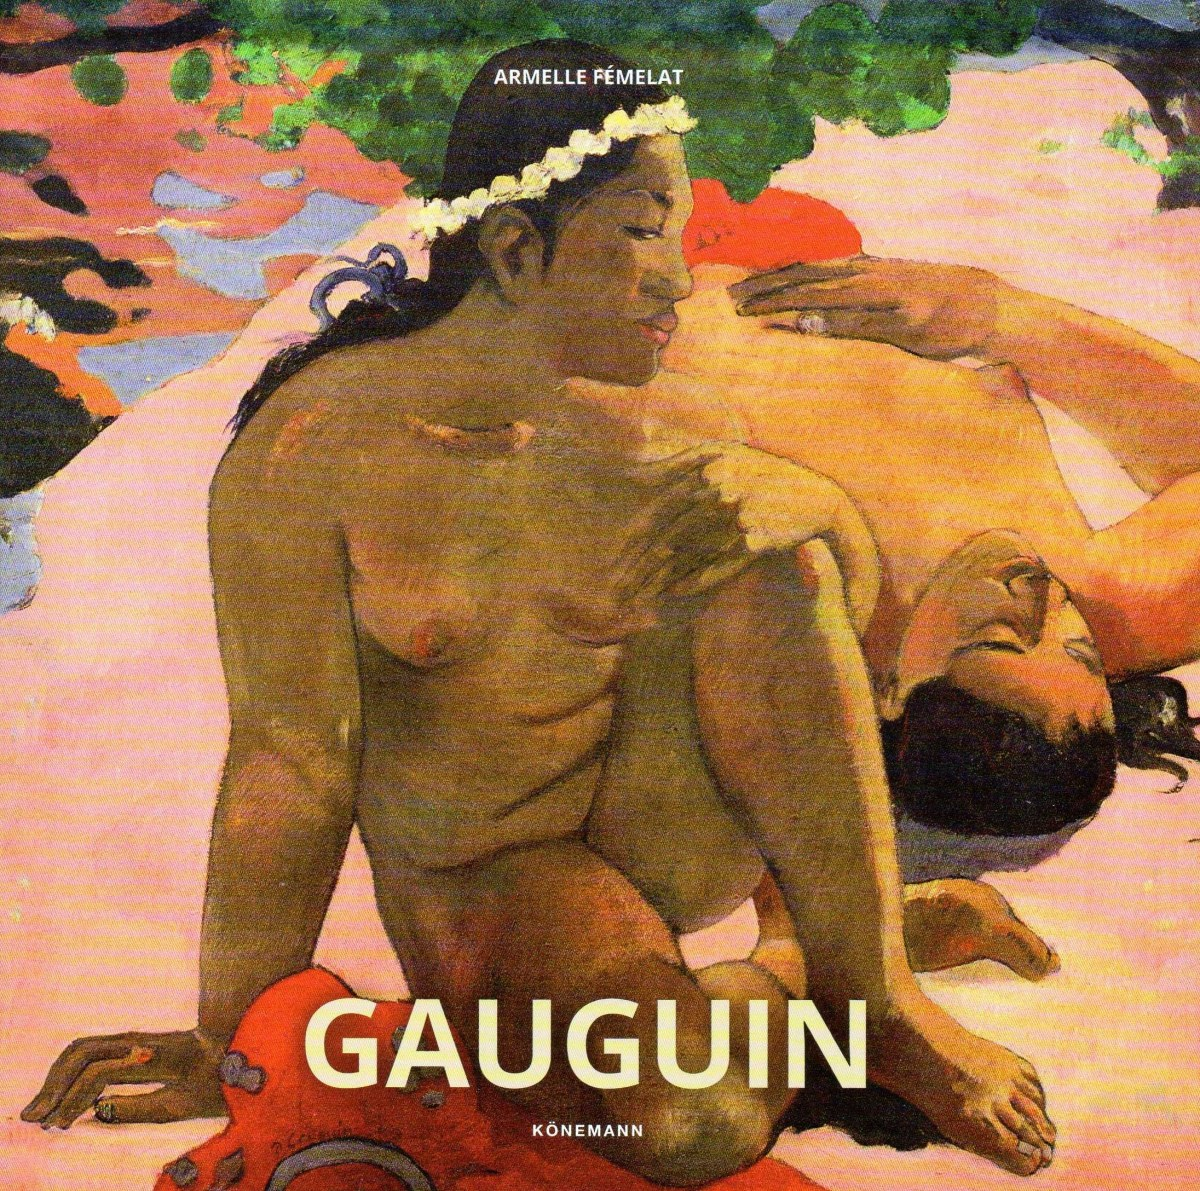 GAUGUIN 9783955886288